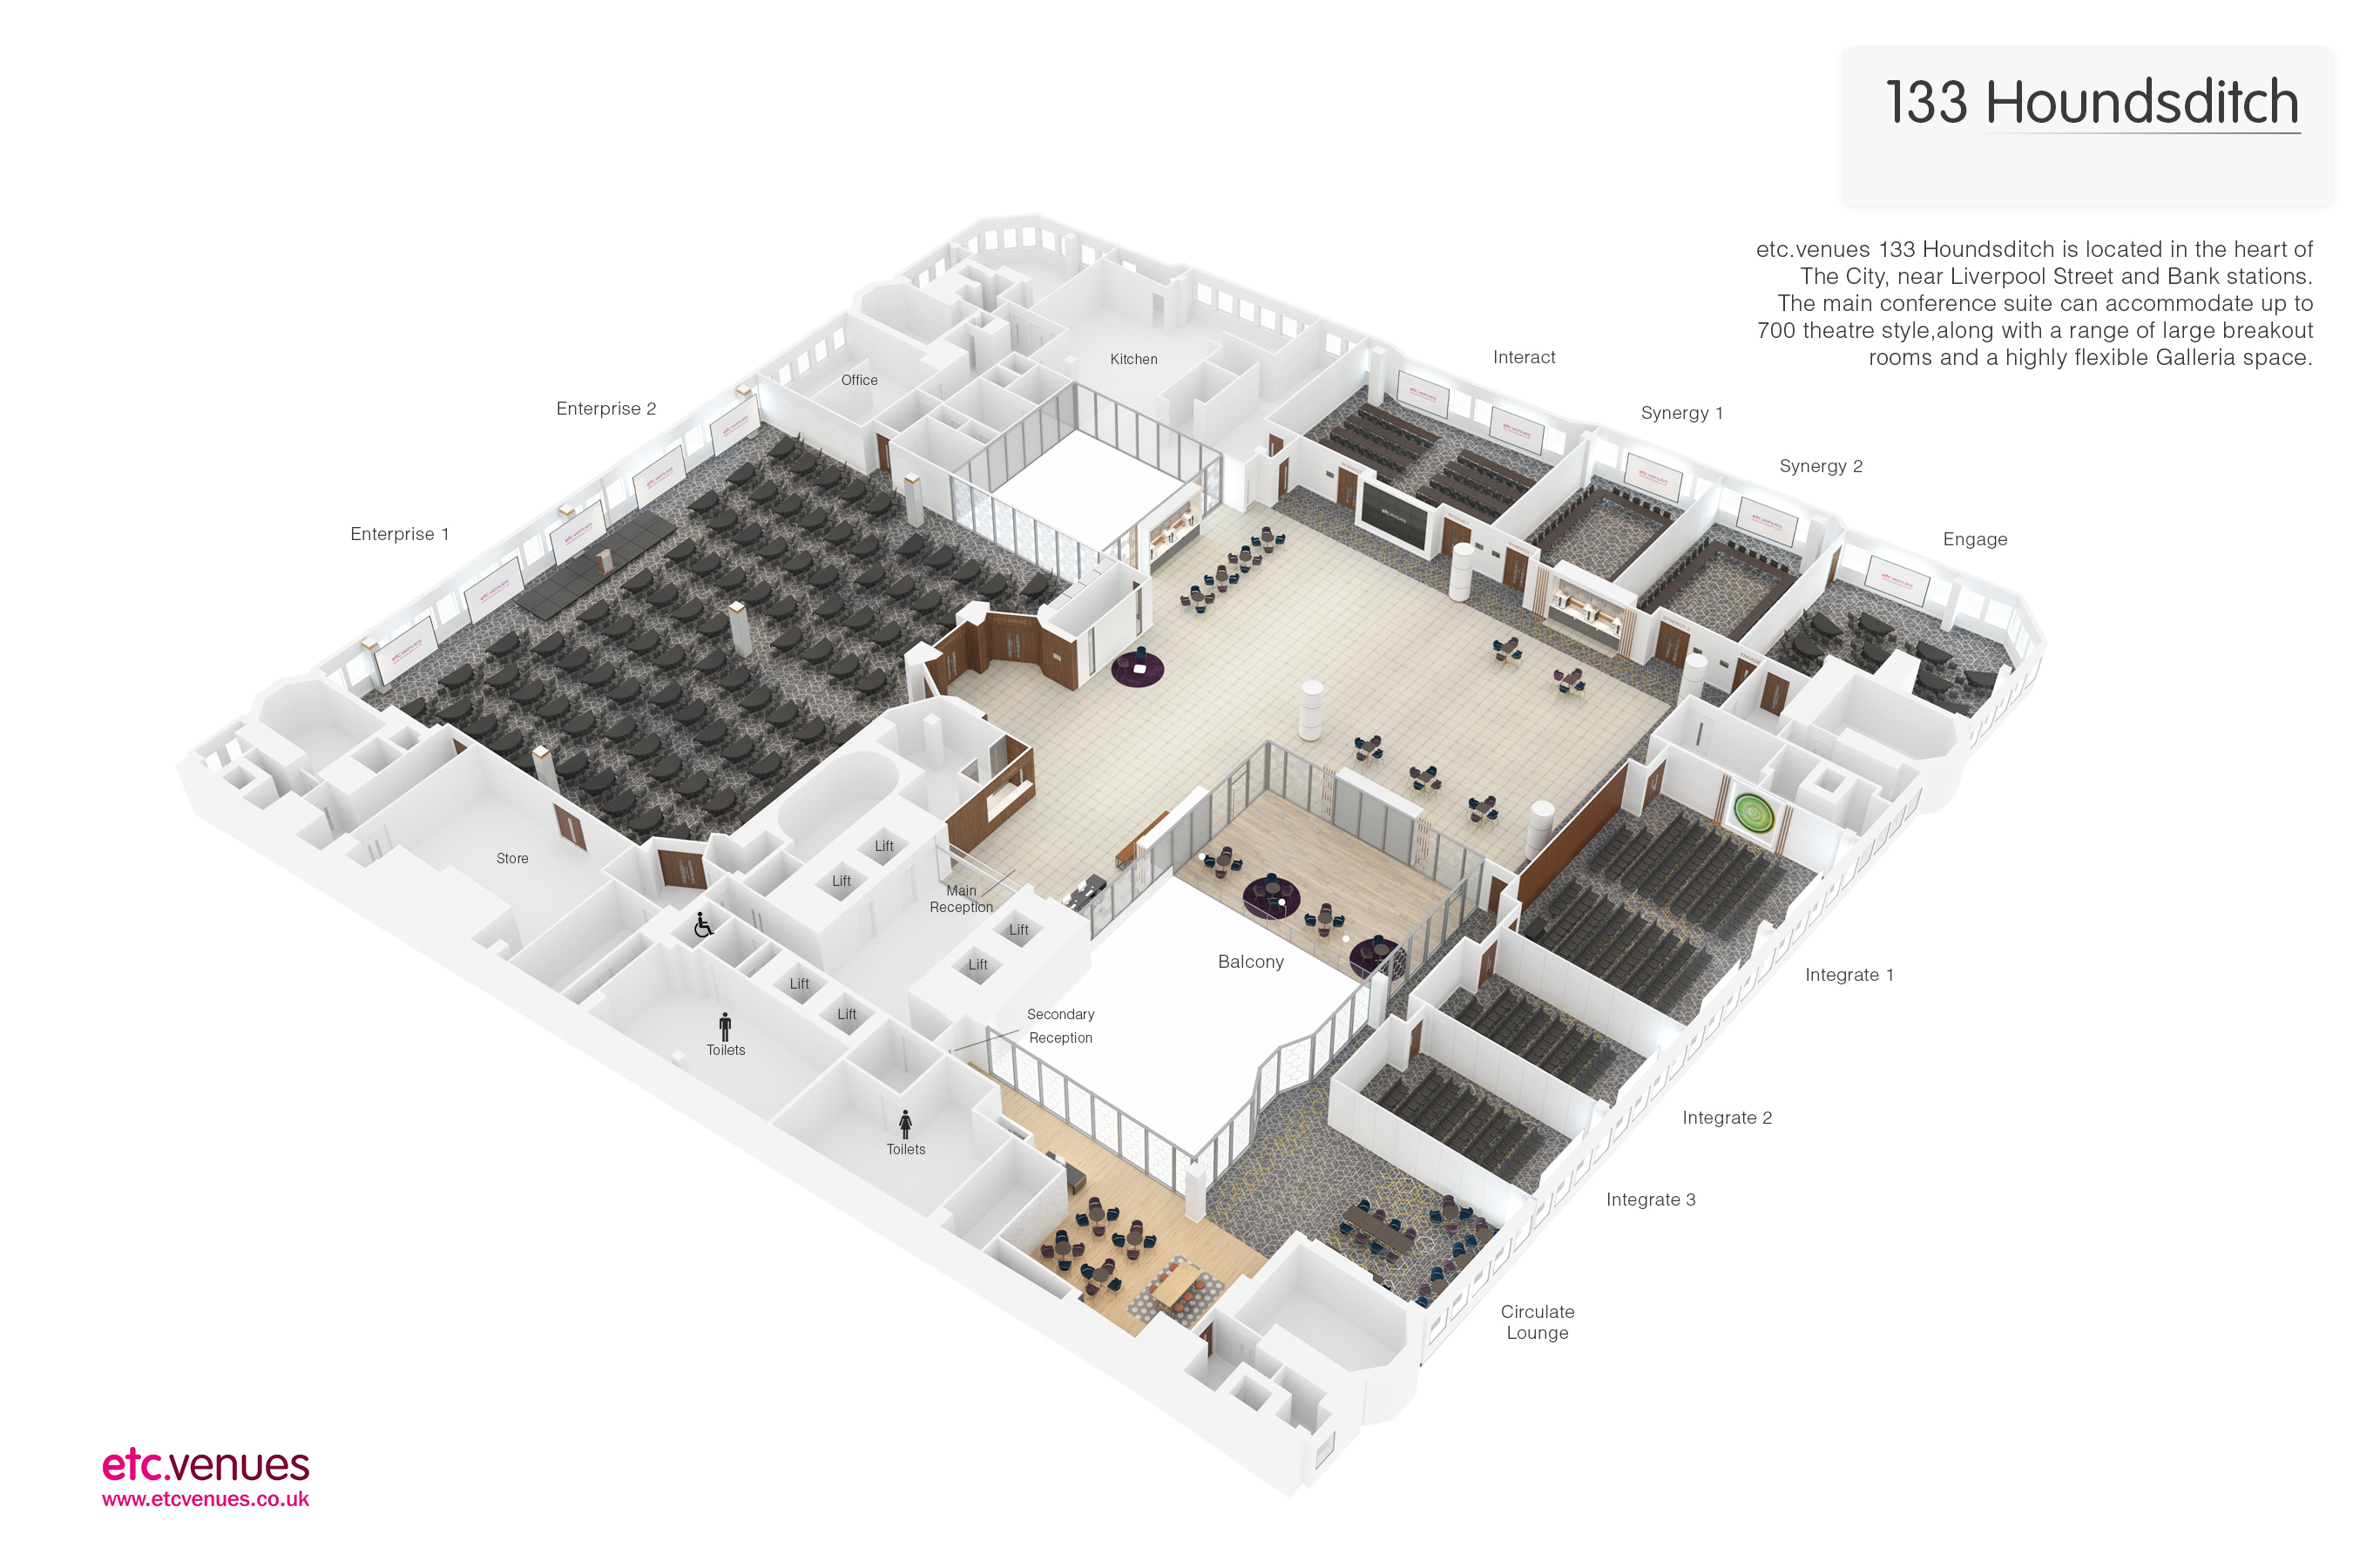 etc venues 133 Houndsditch floorplan